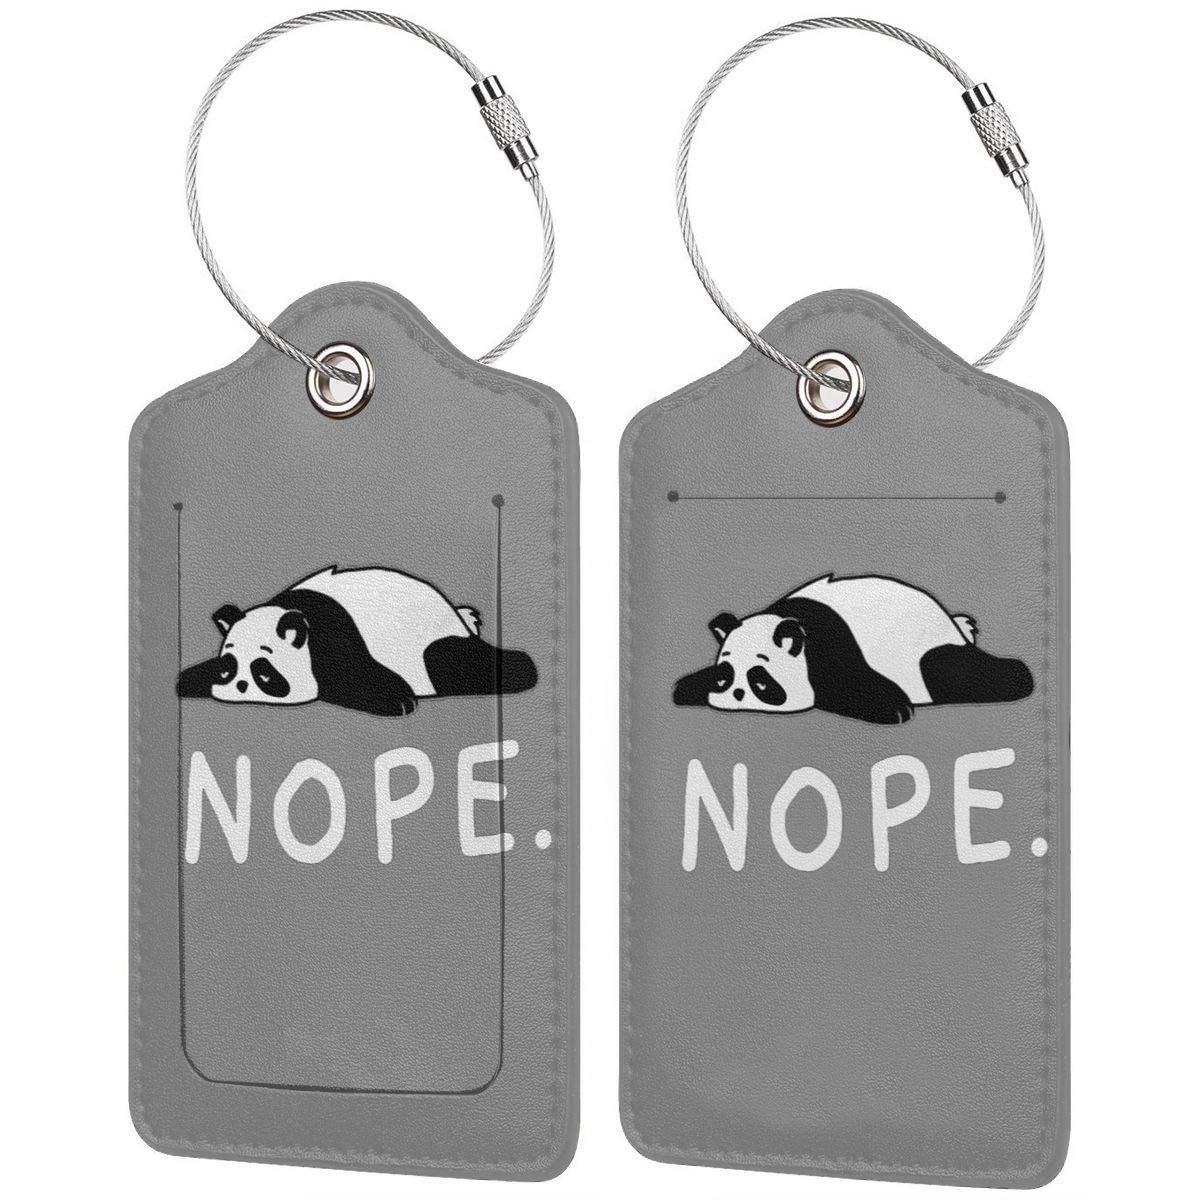 1pcs,2pcs,4pcs Nope Lazy Panda Pu Leather Double Sides Print Luggage Tag Mutilple Packs